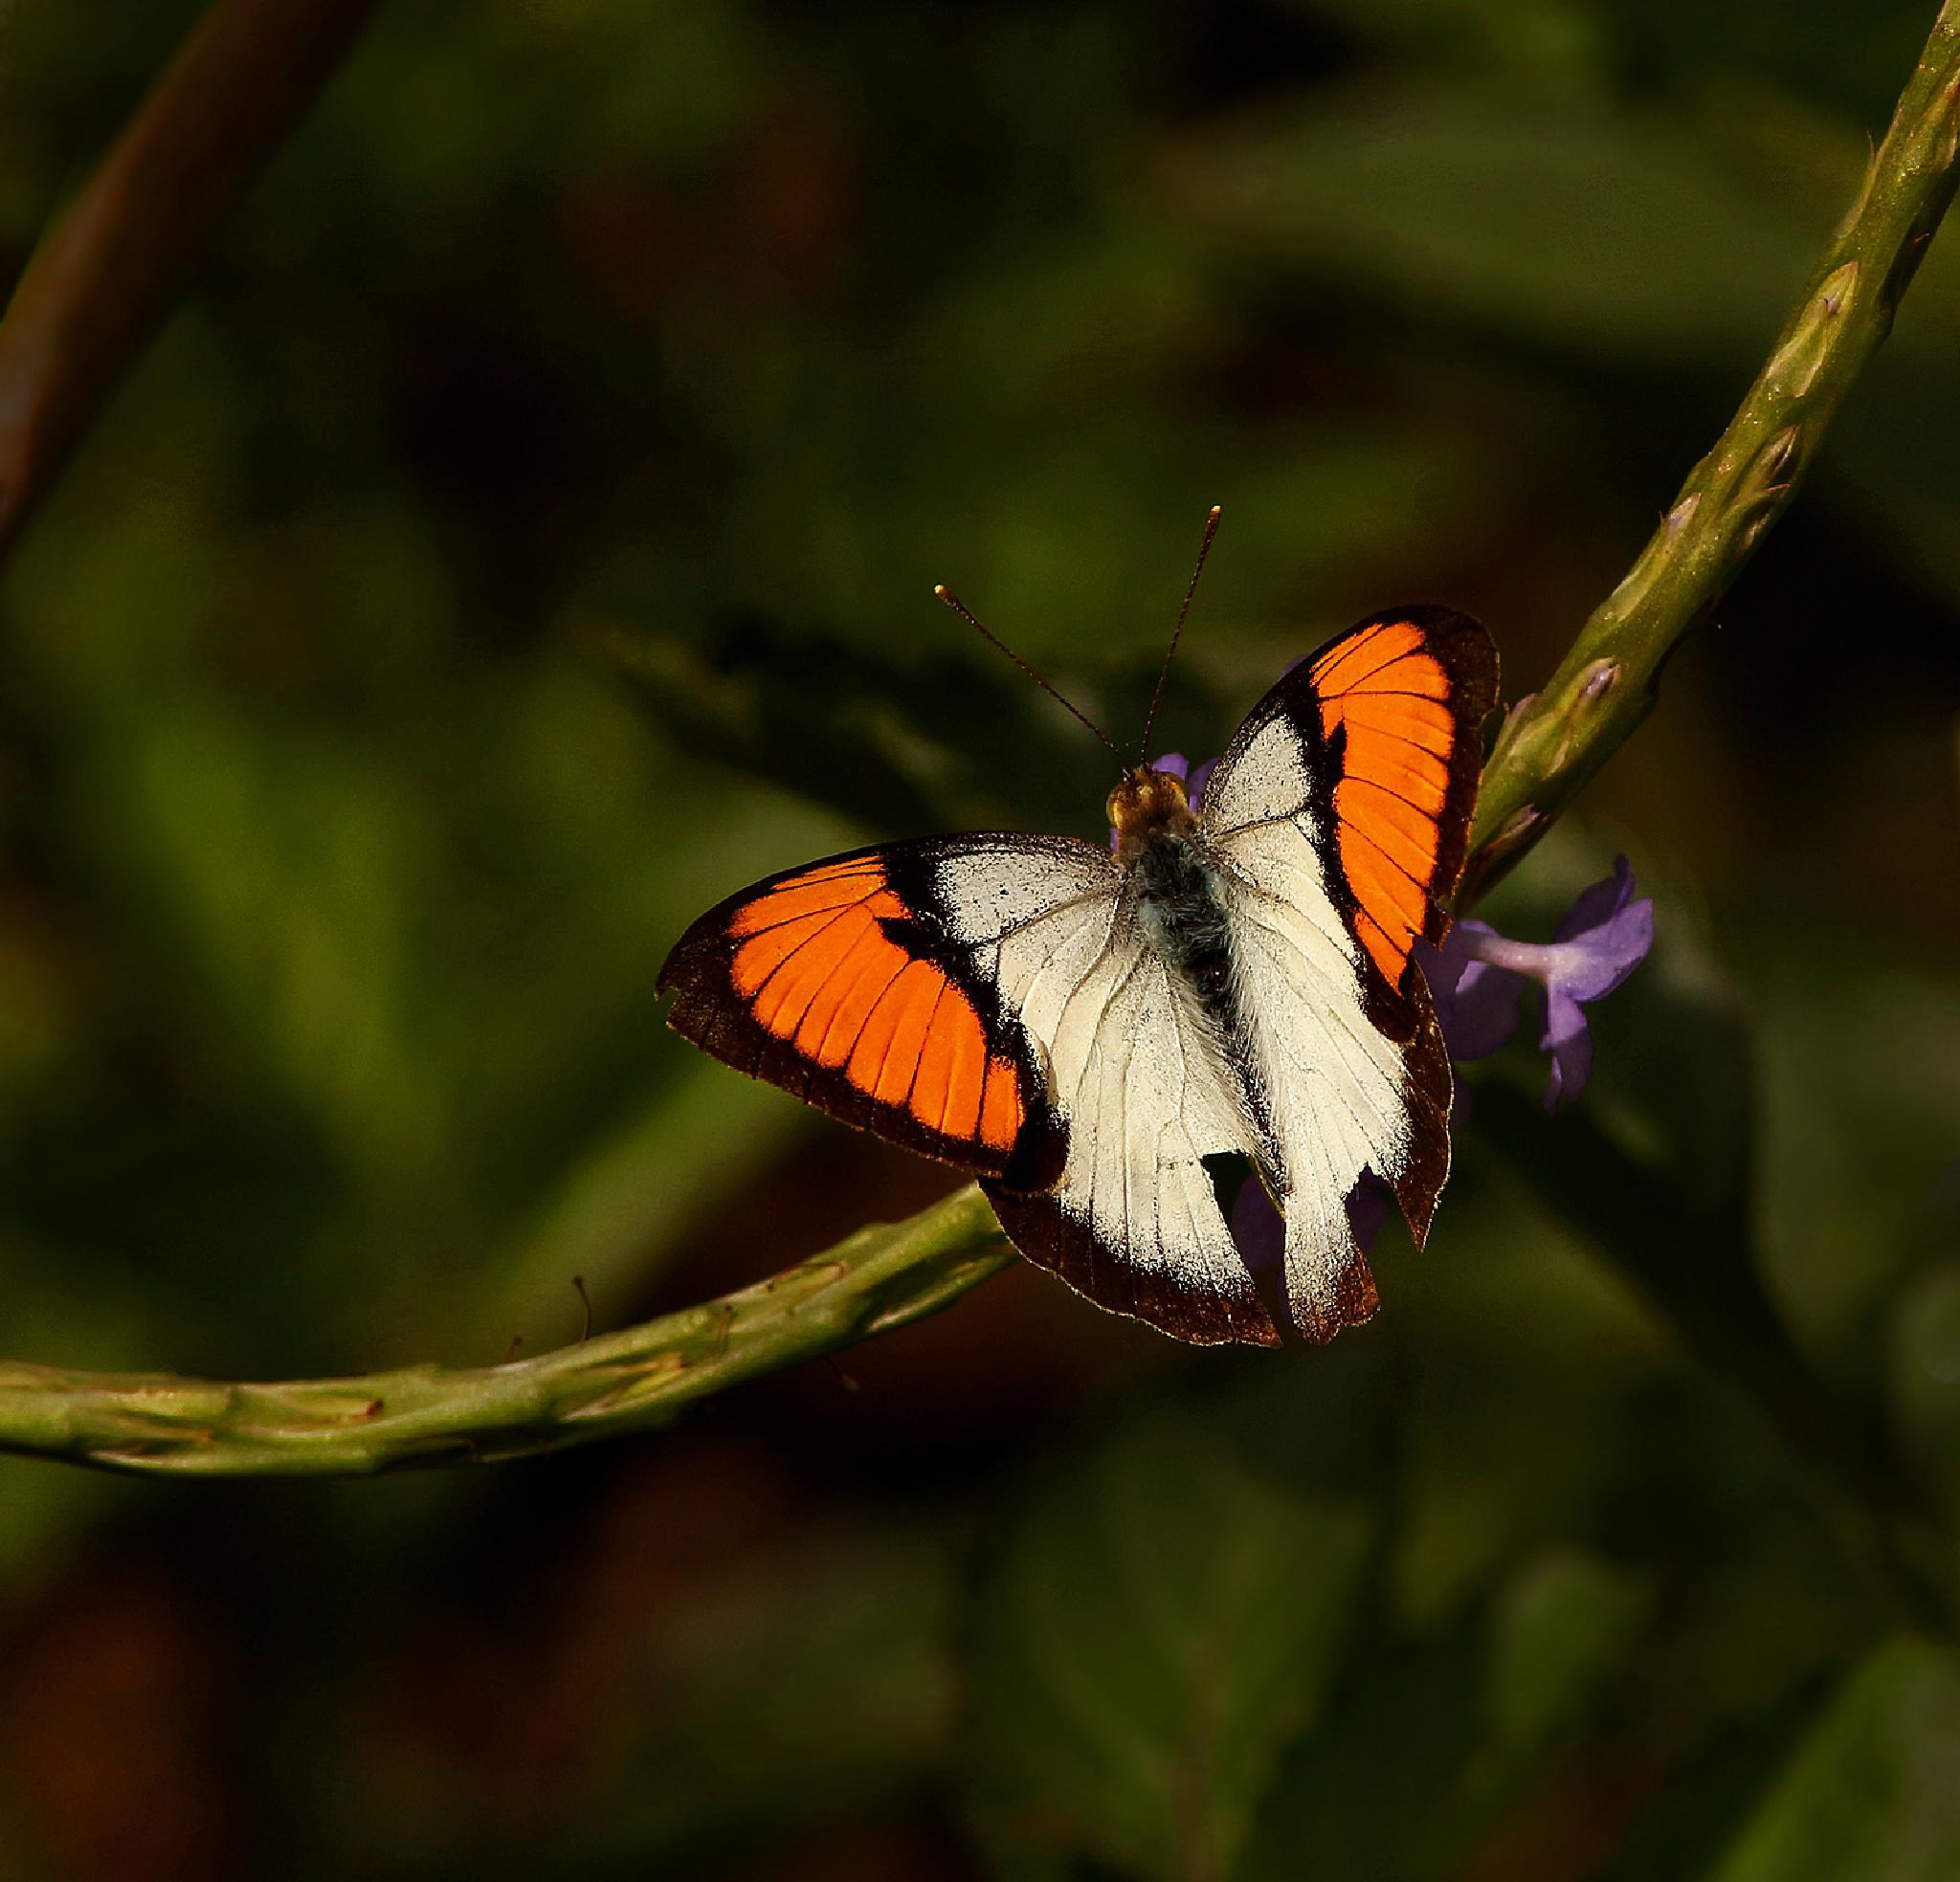 orrange tip butterfly by Ramesha.Samarpana